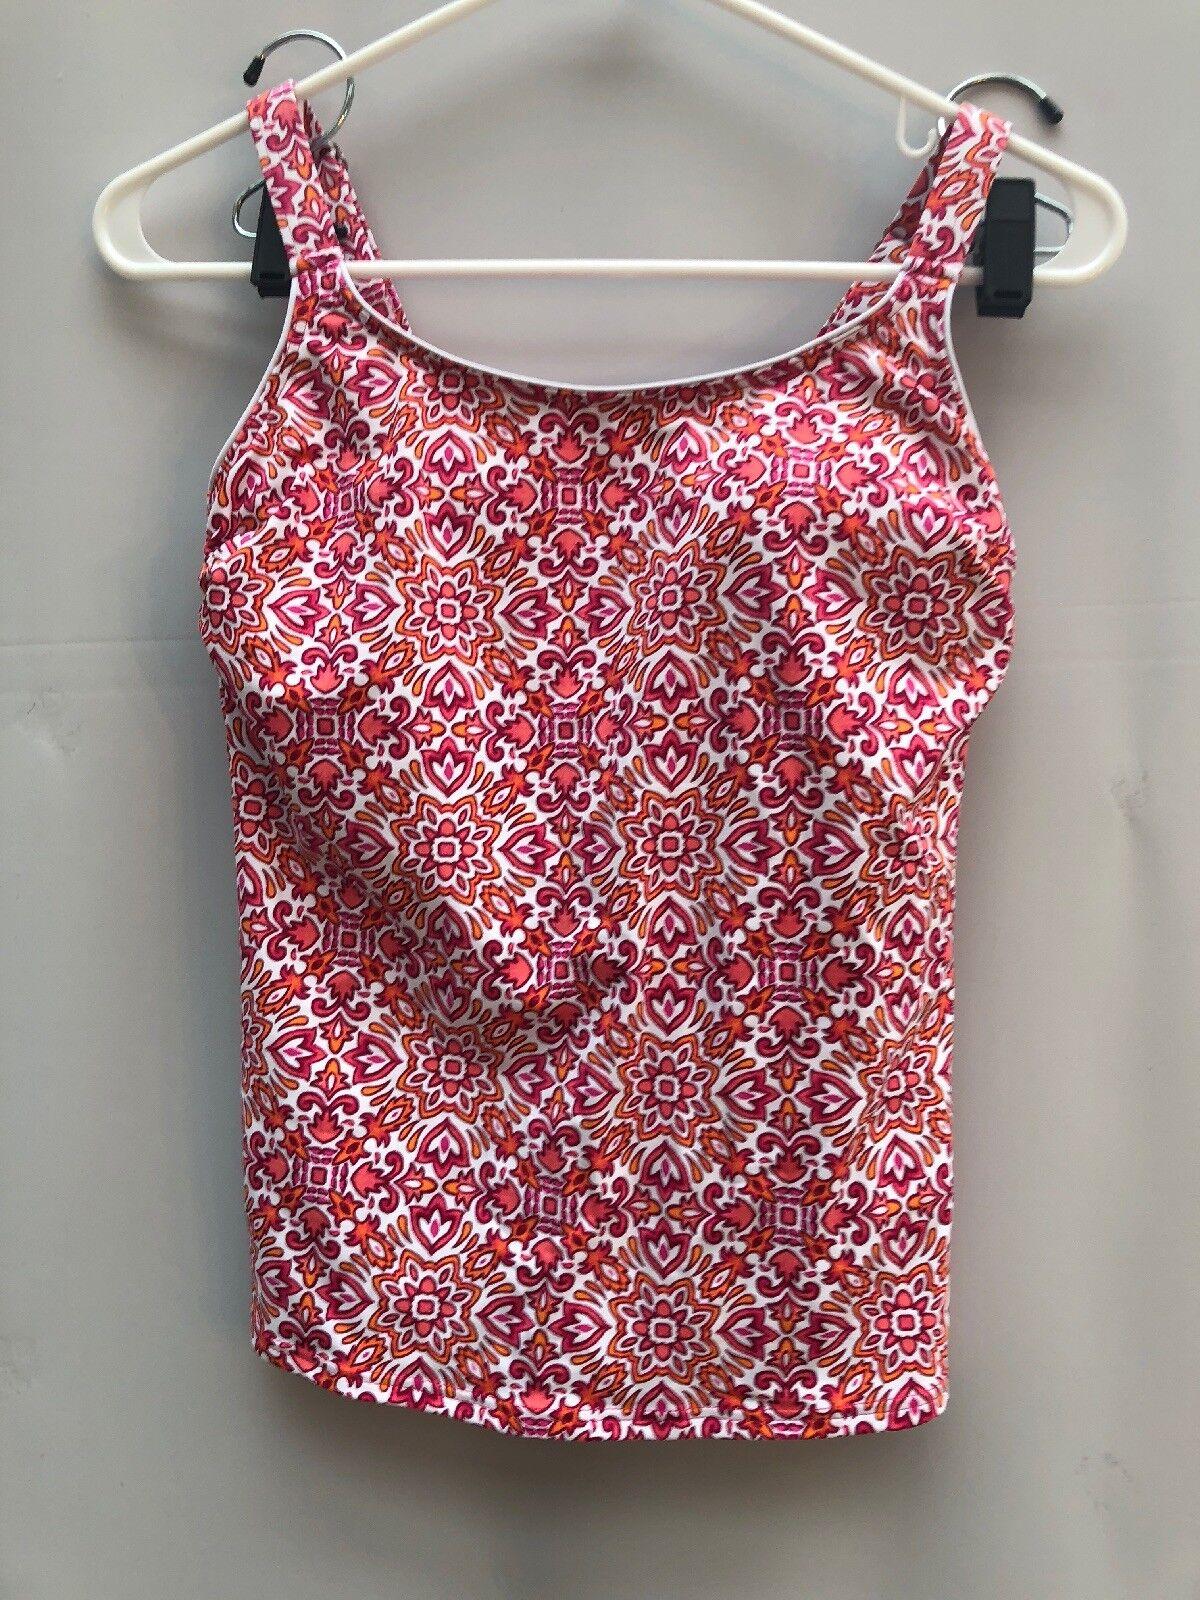 Lands' End Swim Suit Wear Top Tankini Sz 2 Pink